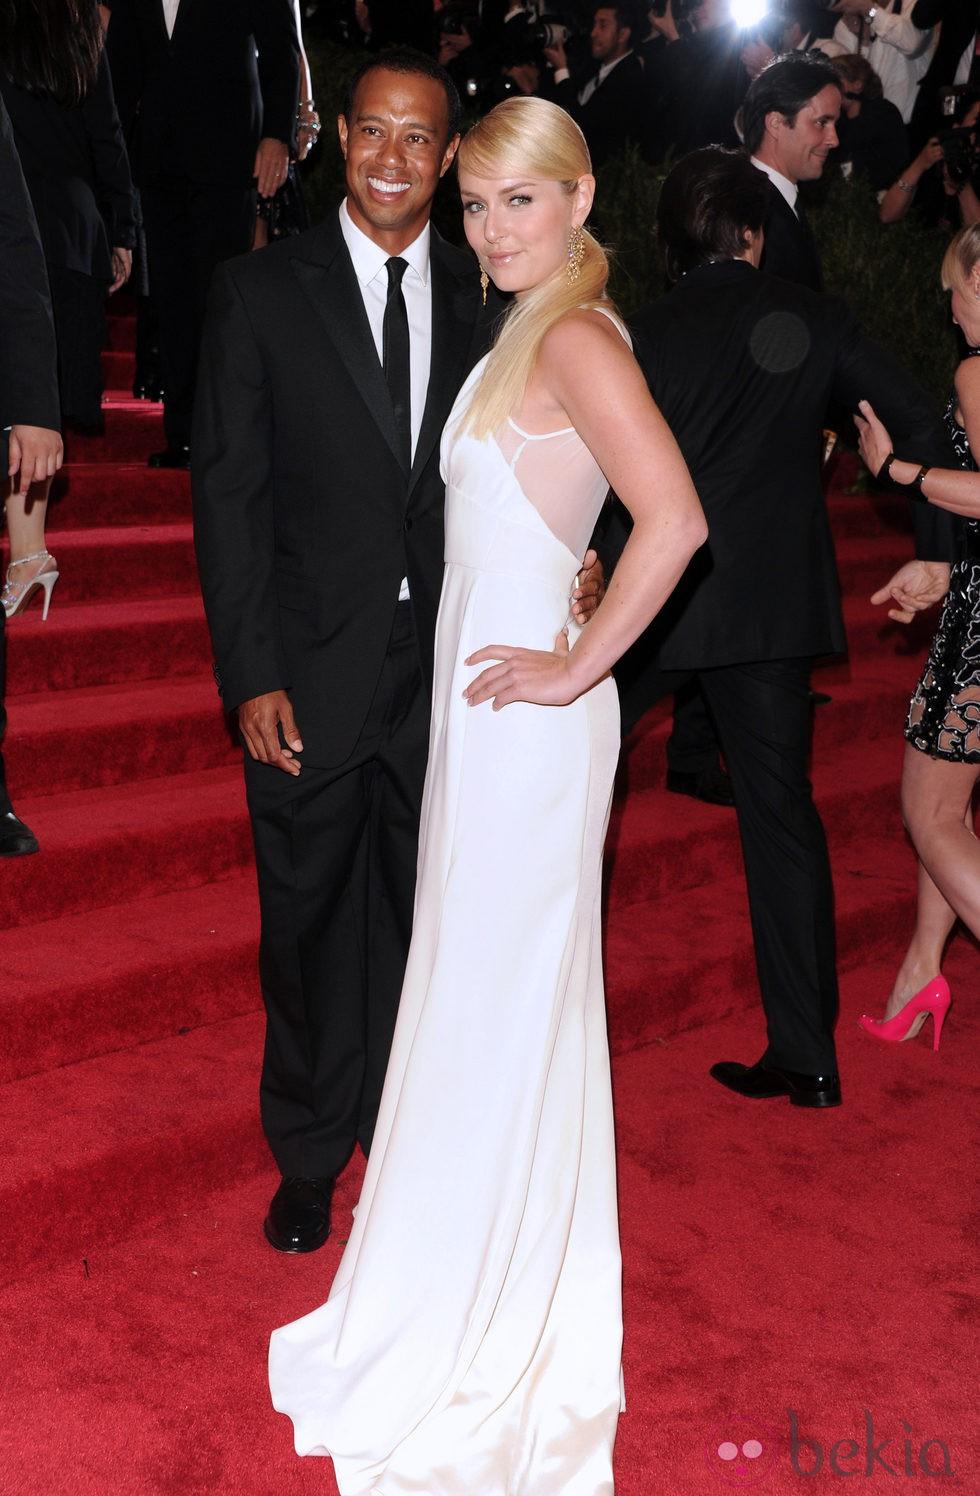 Tiger Woods y Lindsey Vonn en la Gala del MET 2013